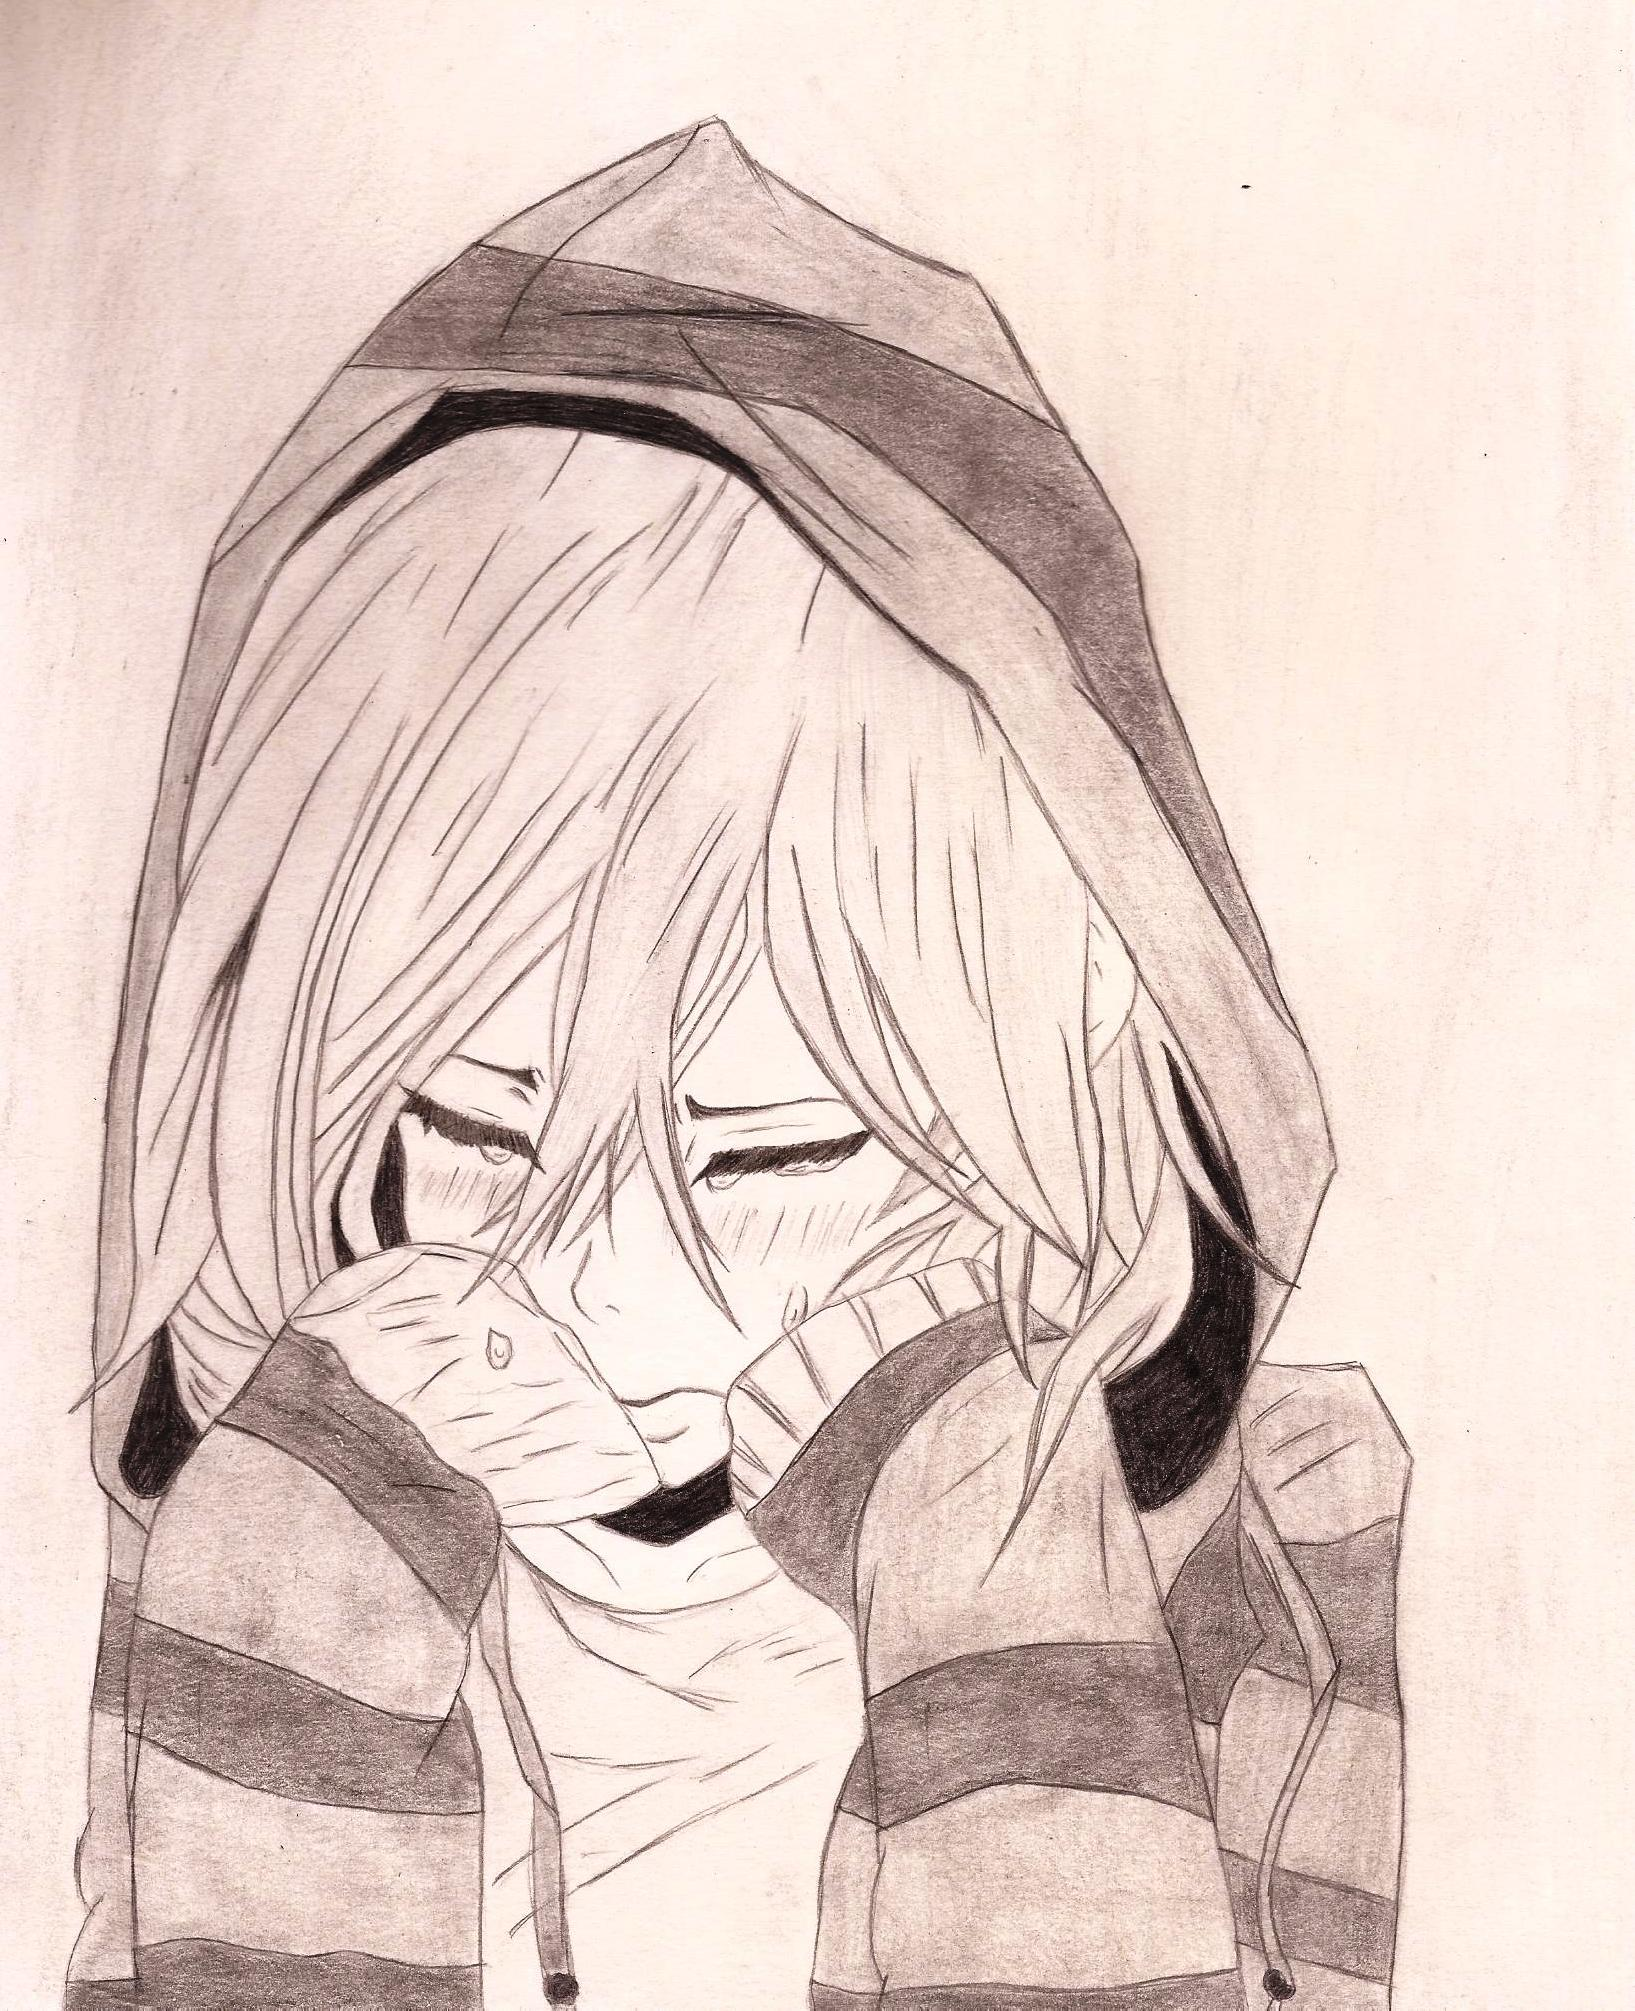 Sad Anime Drawing At Getdrawings Com Free For Personal Use Sad